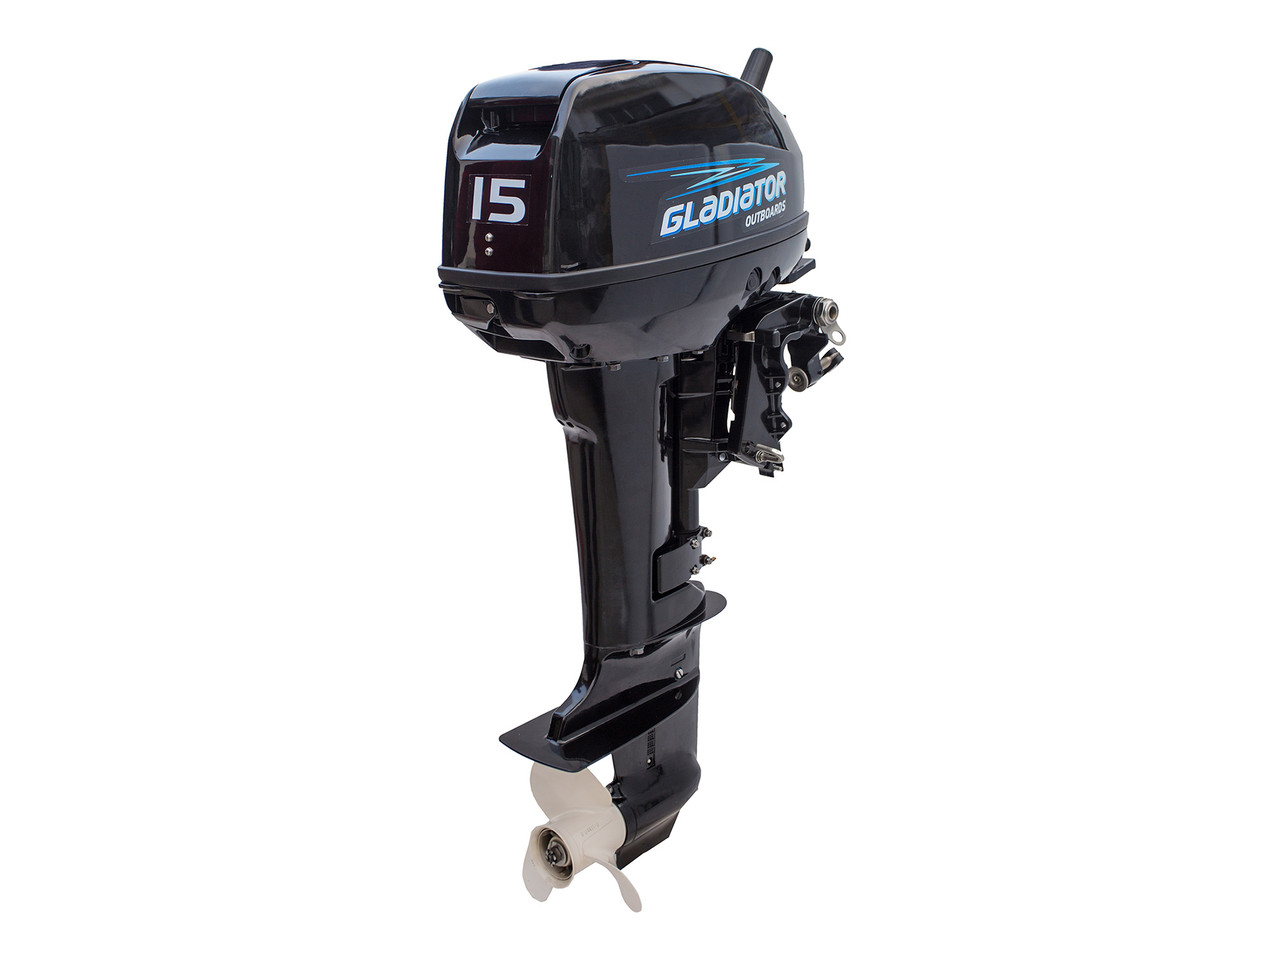 Лодочный мотор GLADIATOR  15лс